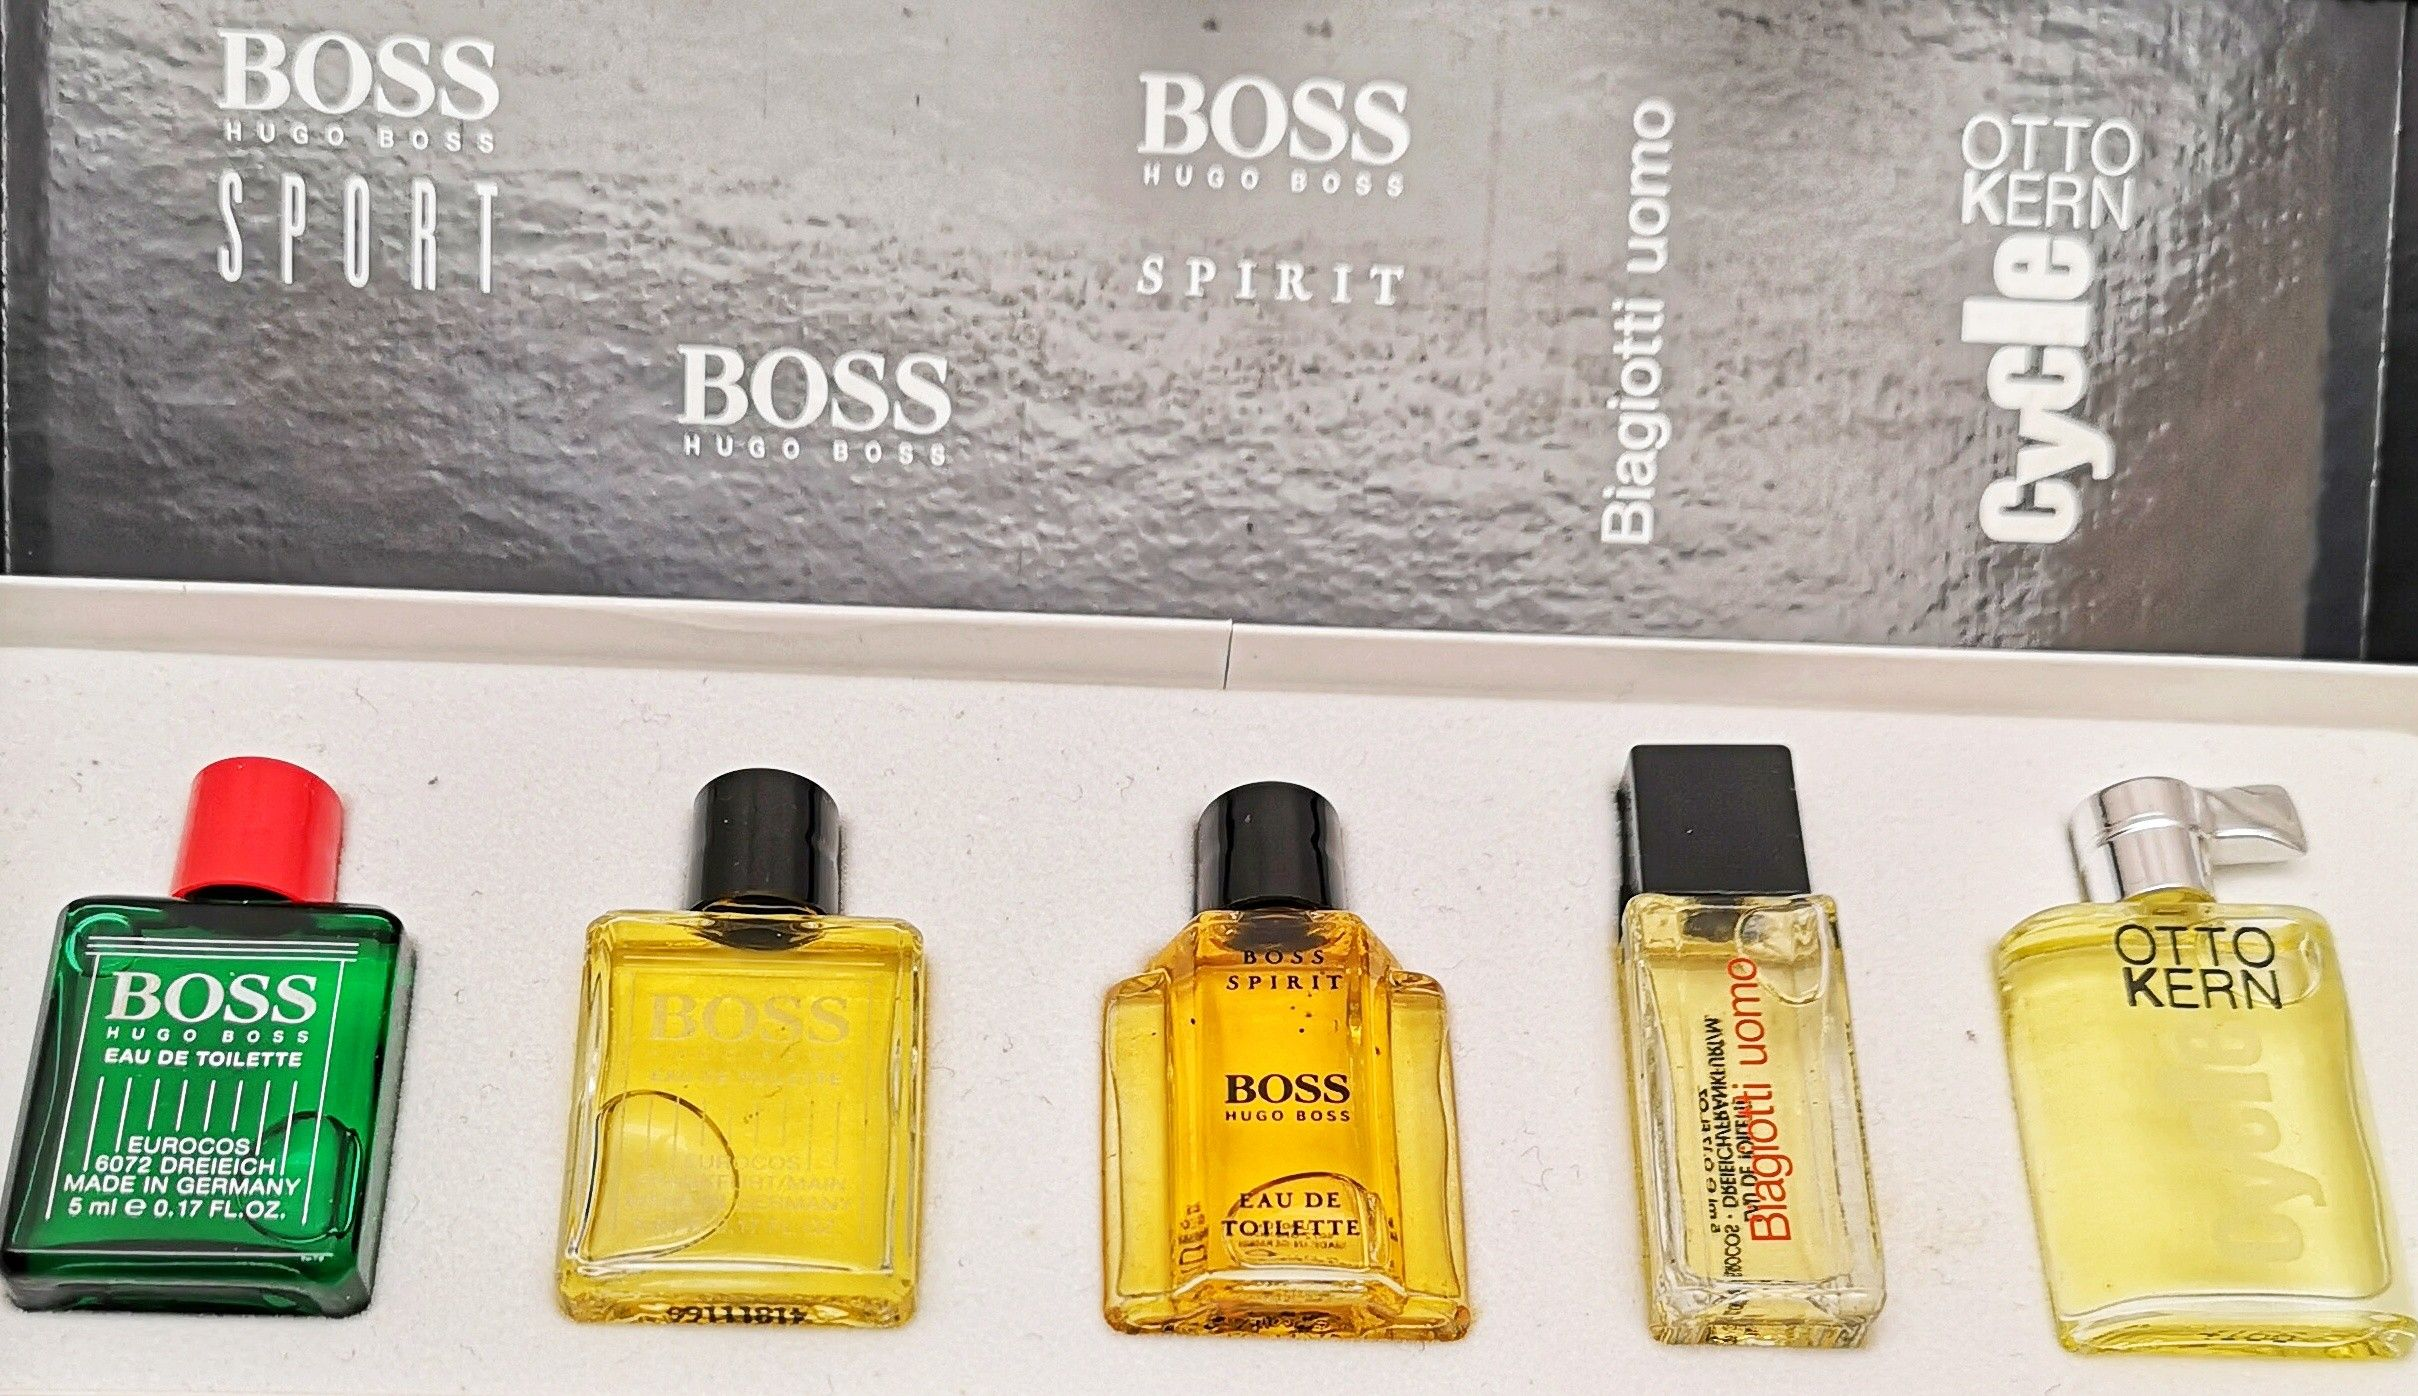 Pin by Monika Šva on My mini perfume collection in 2020